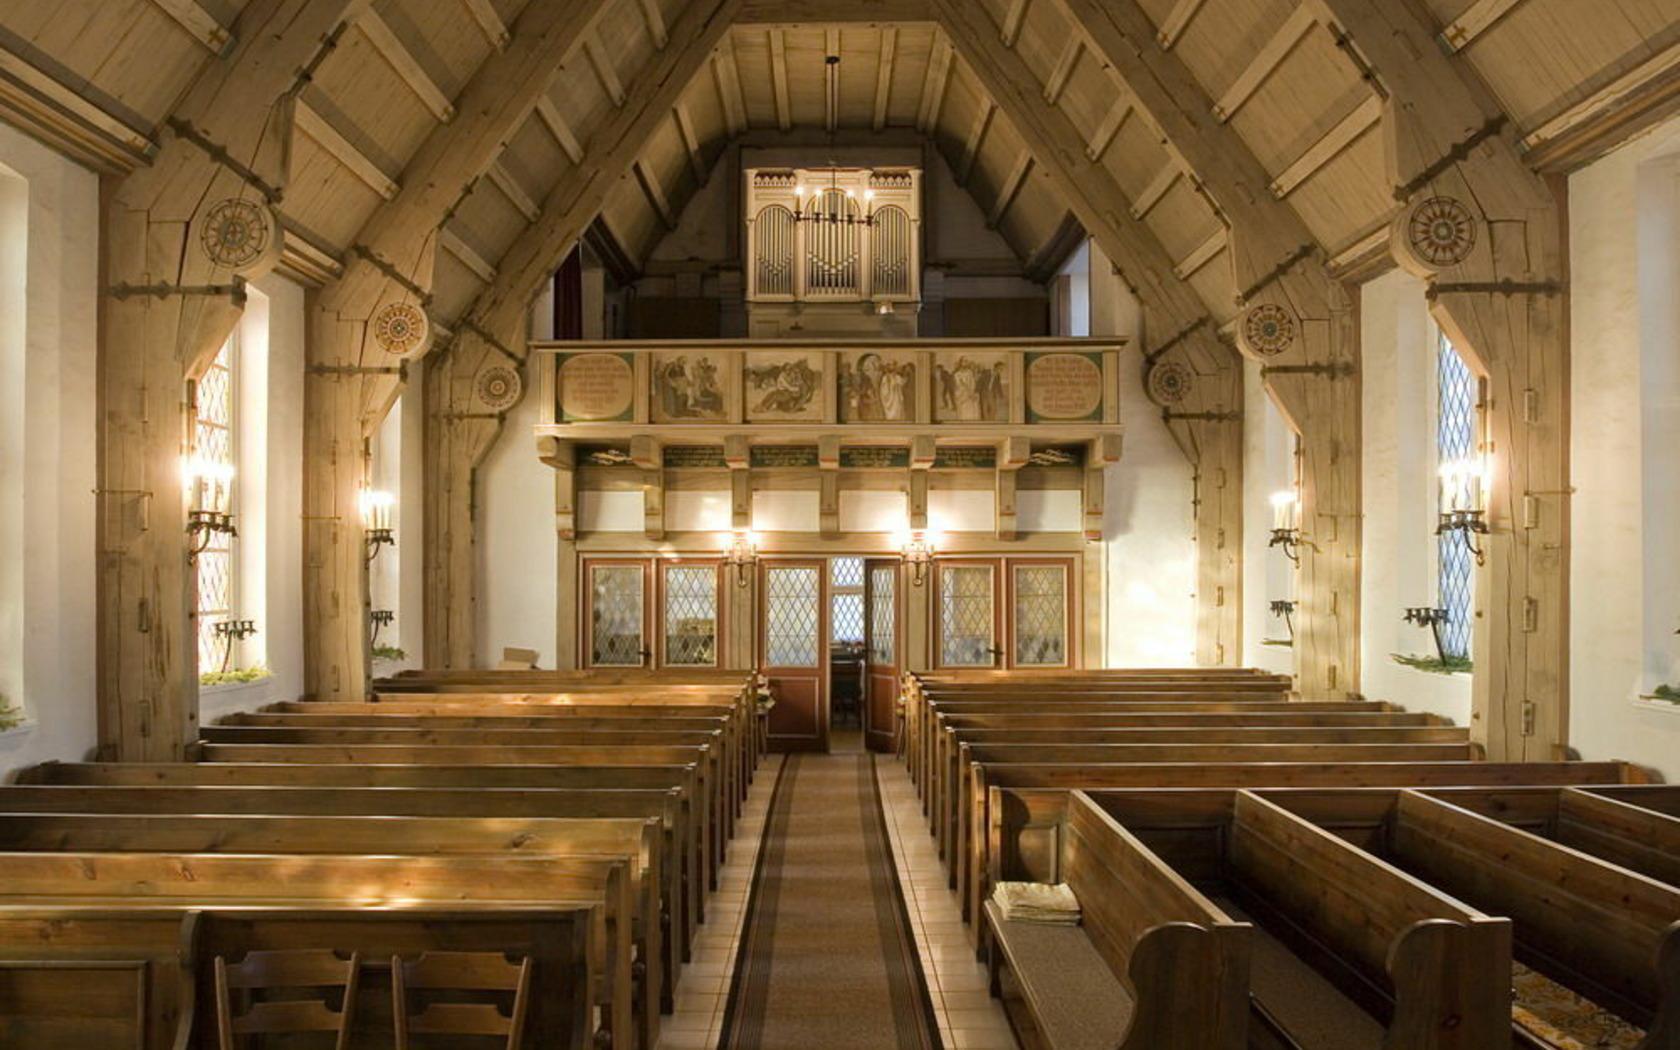 Innenraum Kirche Kerkwitz, Foto: Katharina Riedel